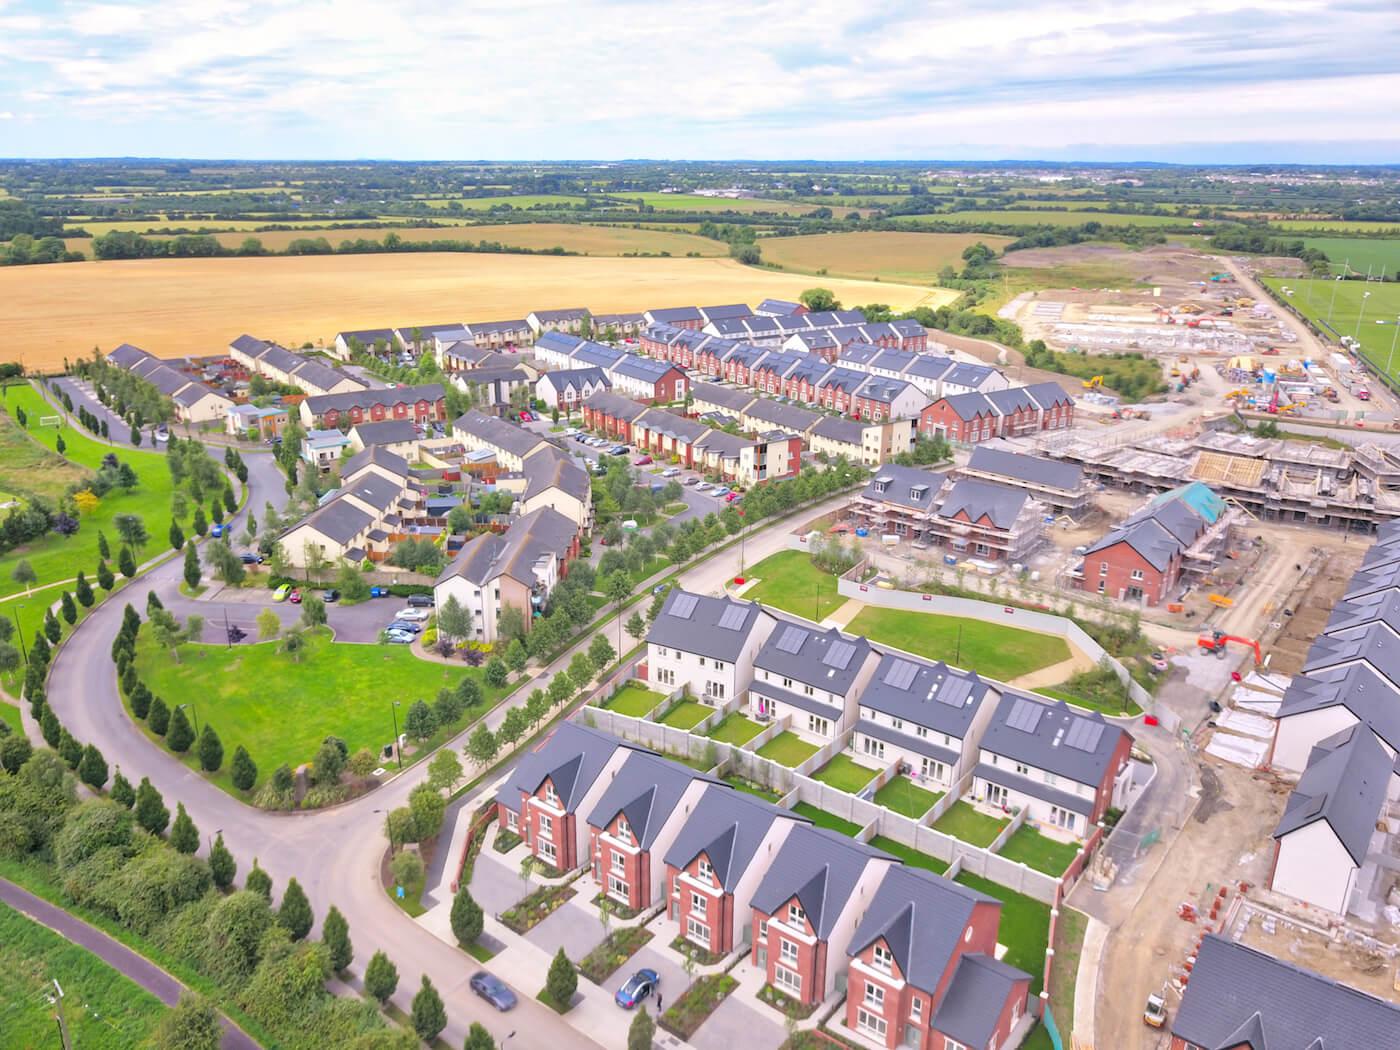 Churchfields Ashbourne by Air View Marketing